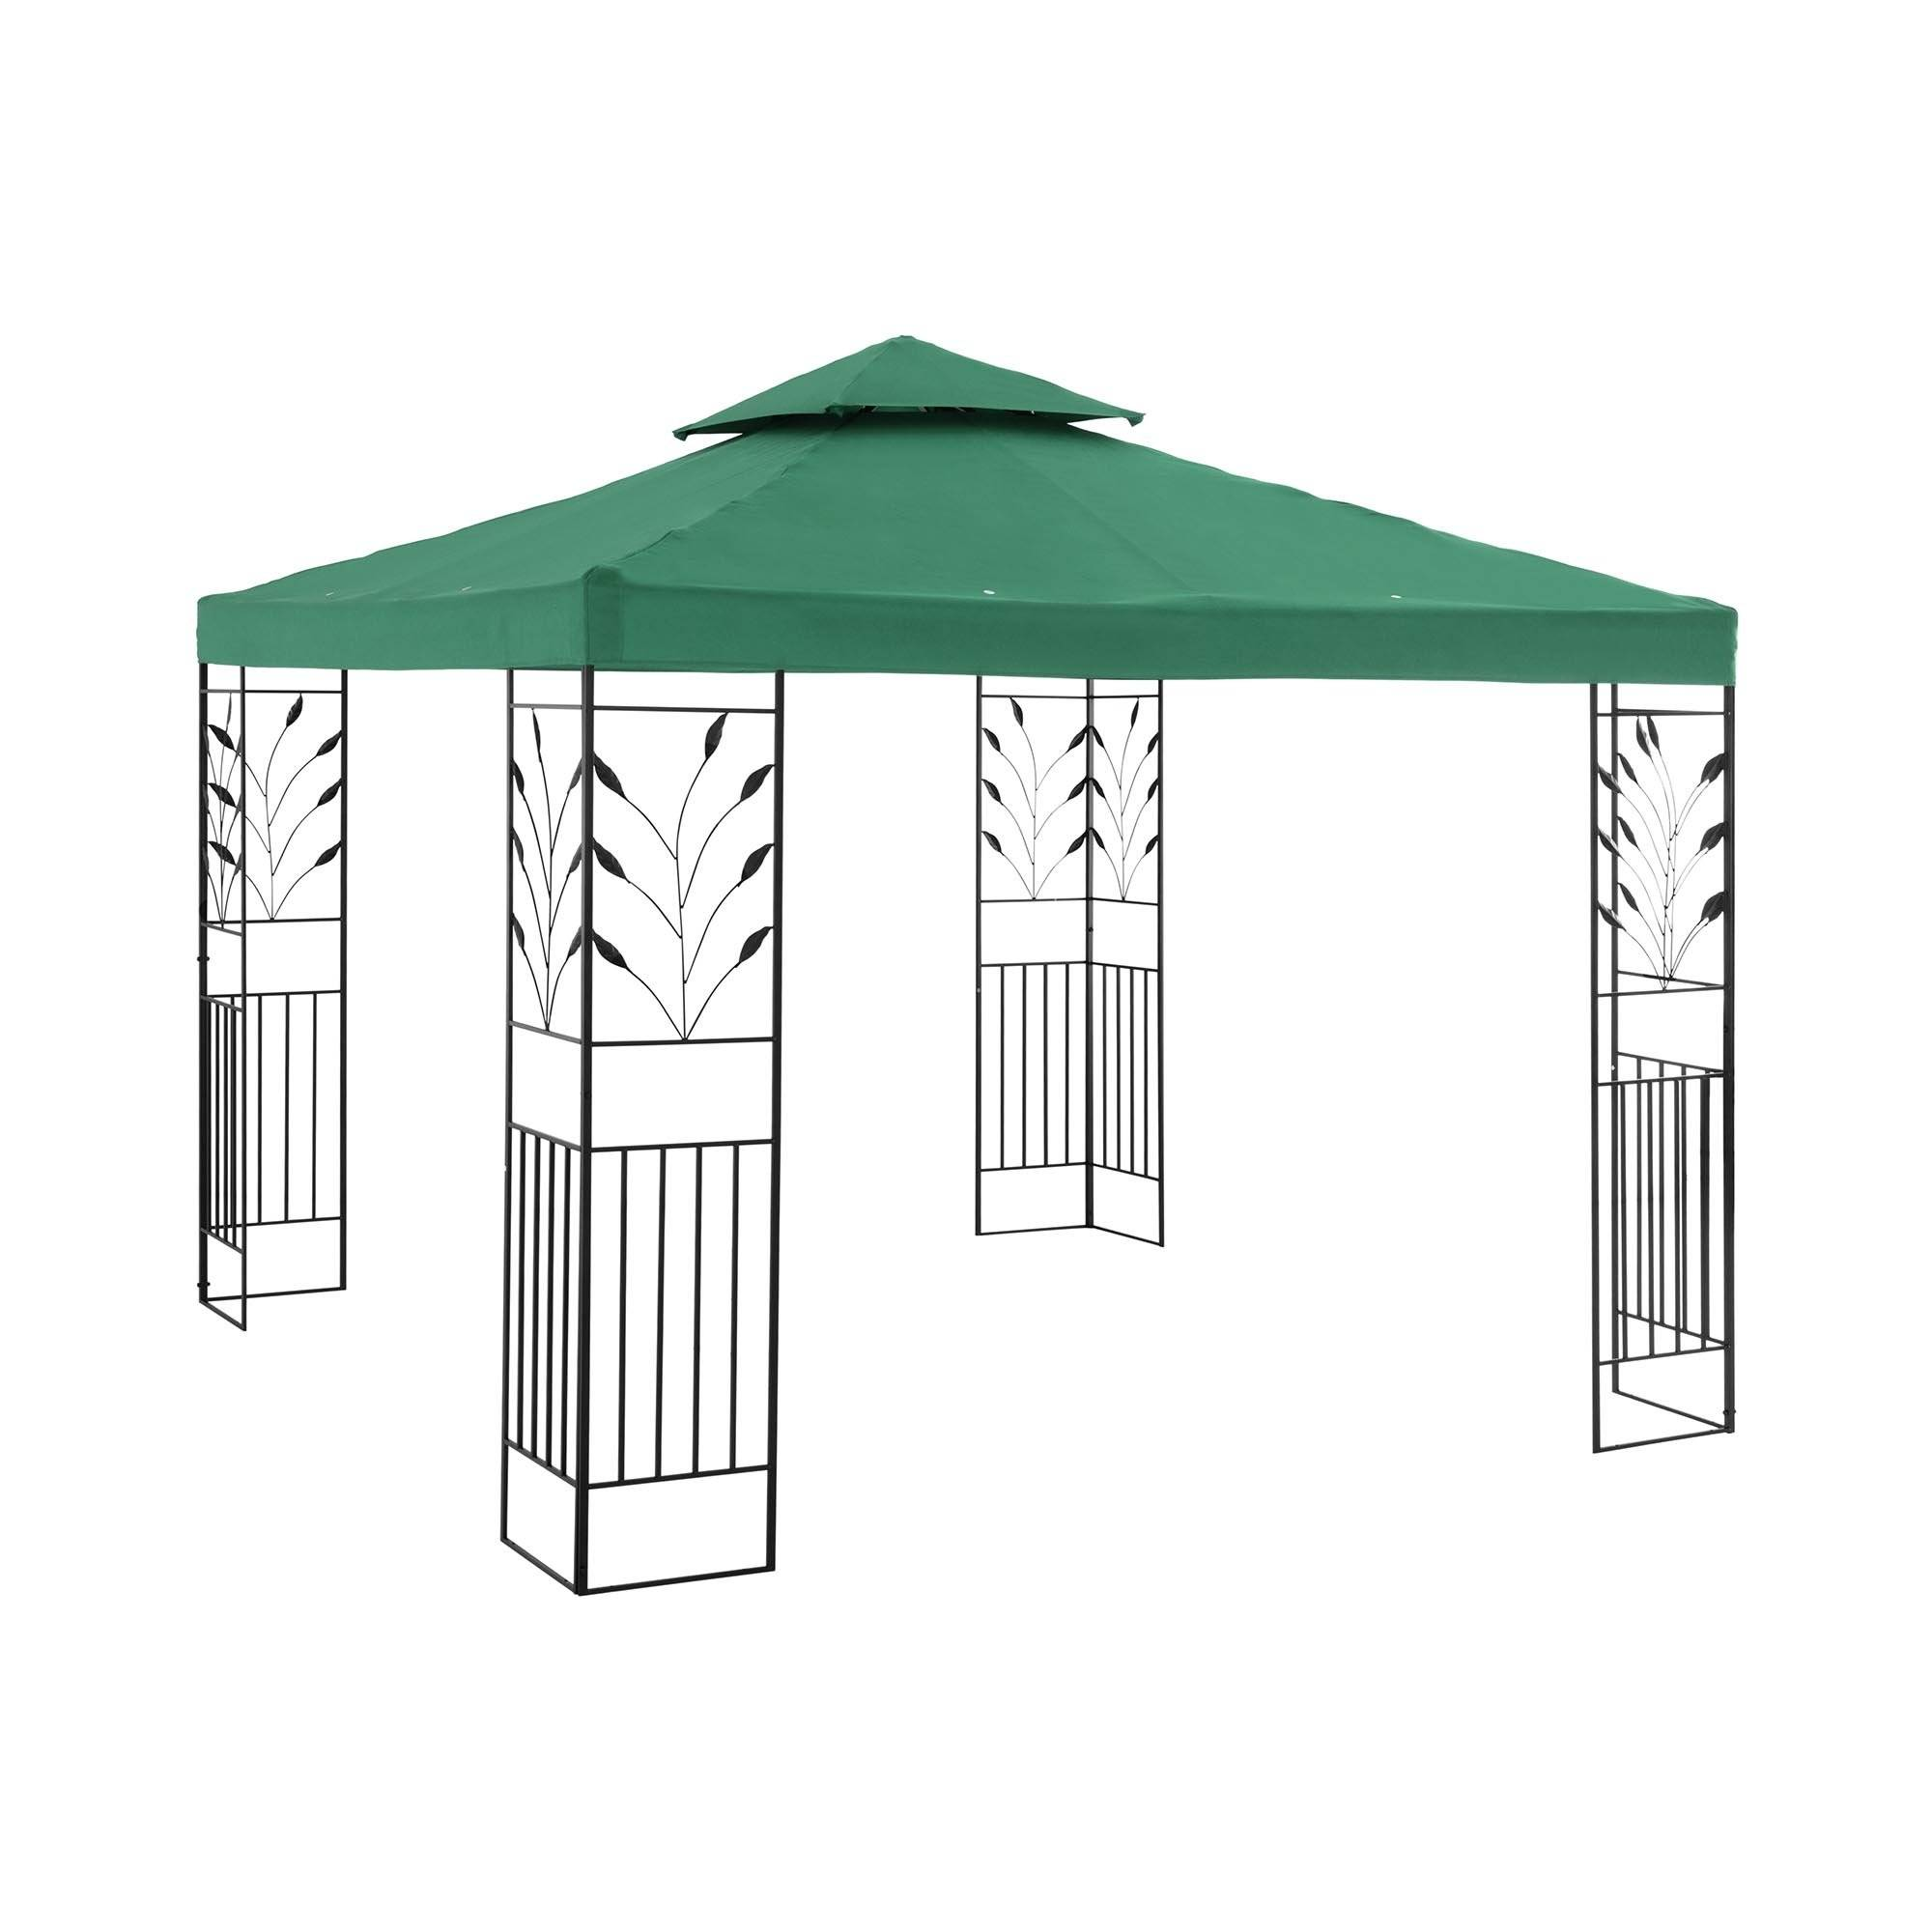 Uniprodo Garden Pavilion - 3 x 3 m - 180 g/m² - dark green